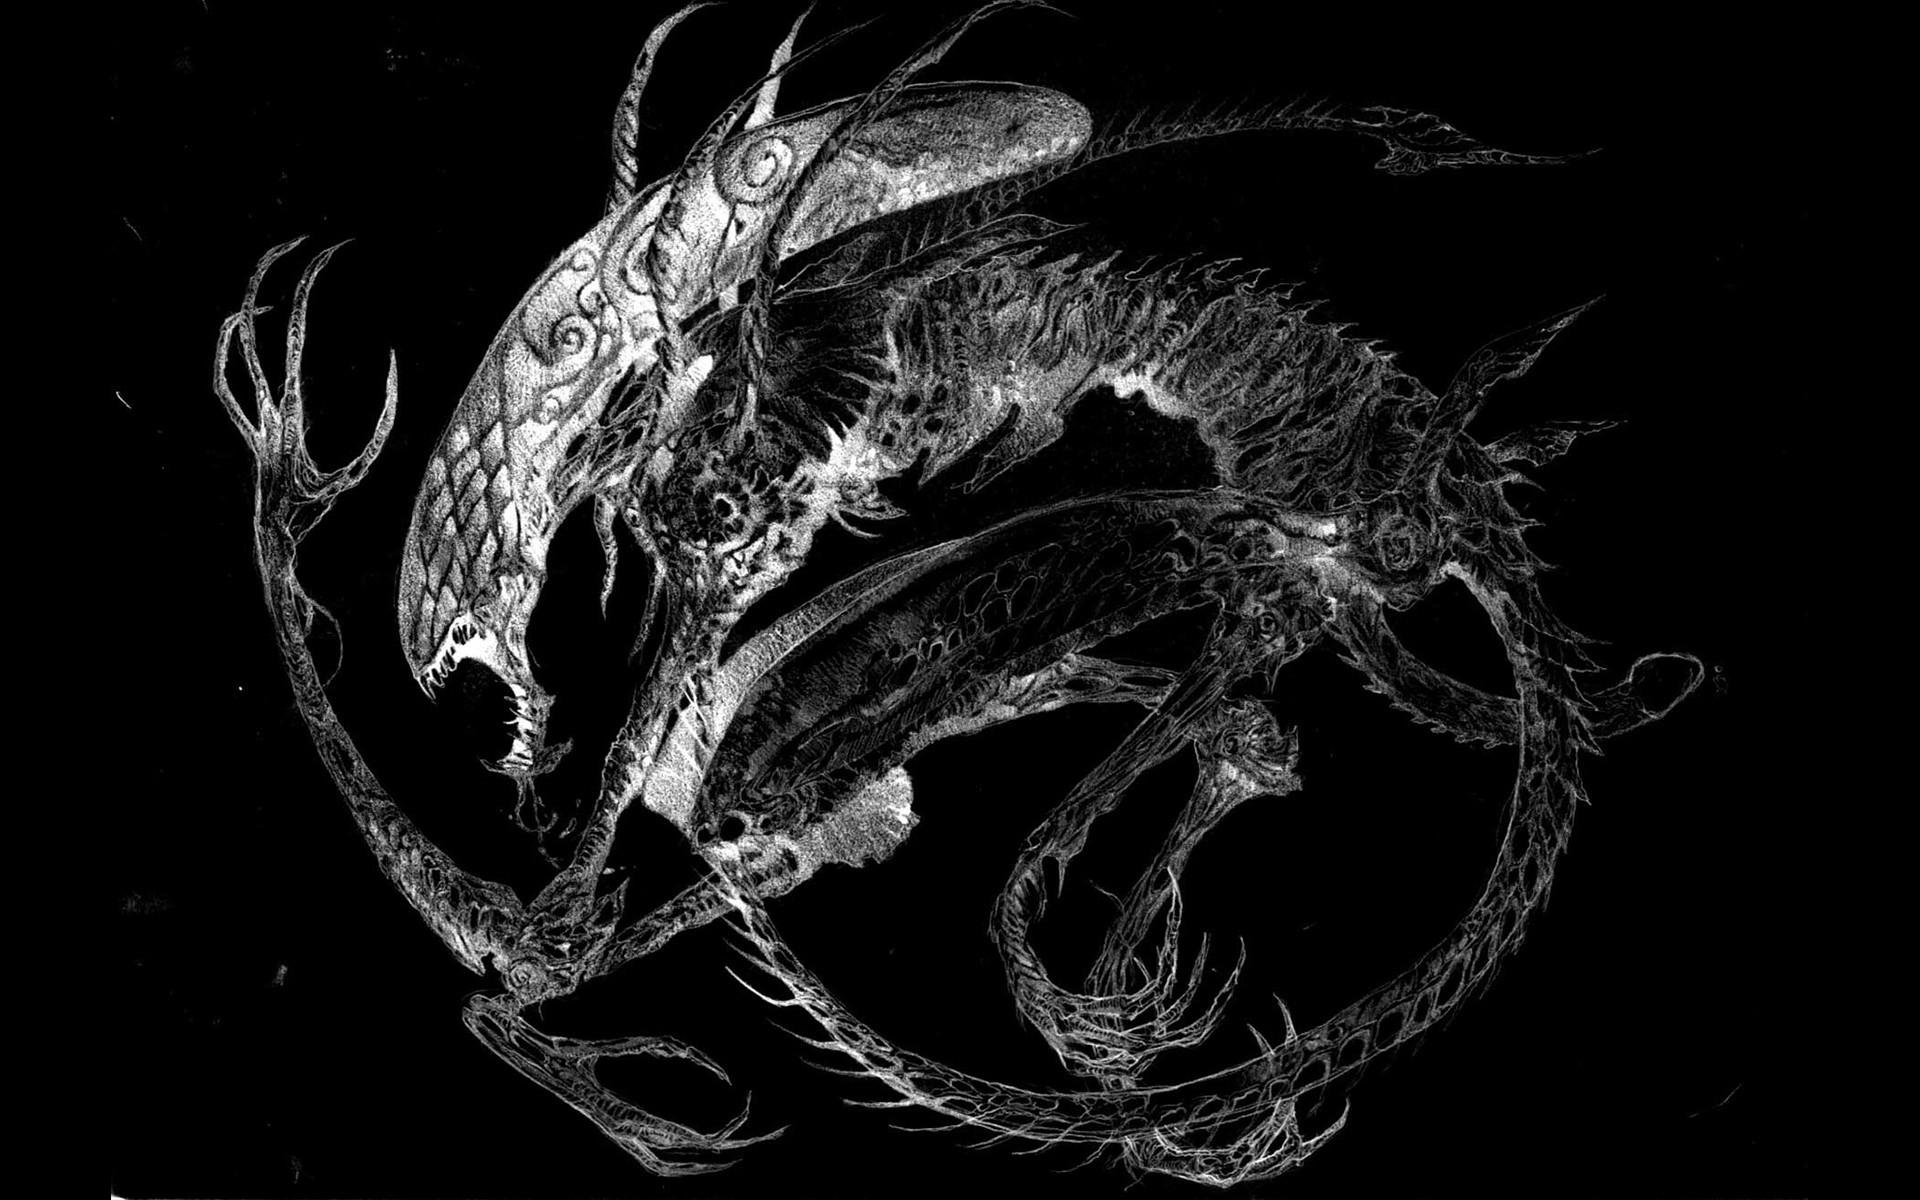 movies Xenomorph science fiction Alien fan art black background H_R_ Giger  wallpaper